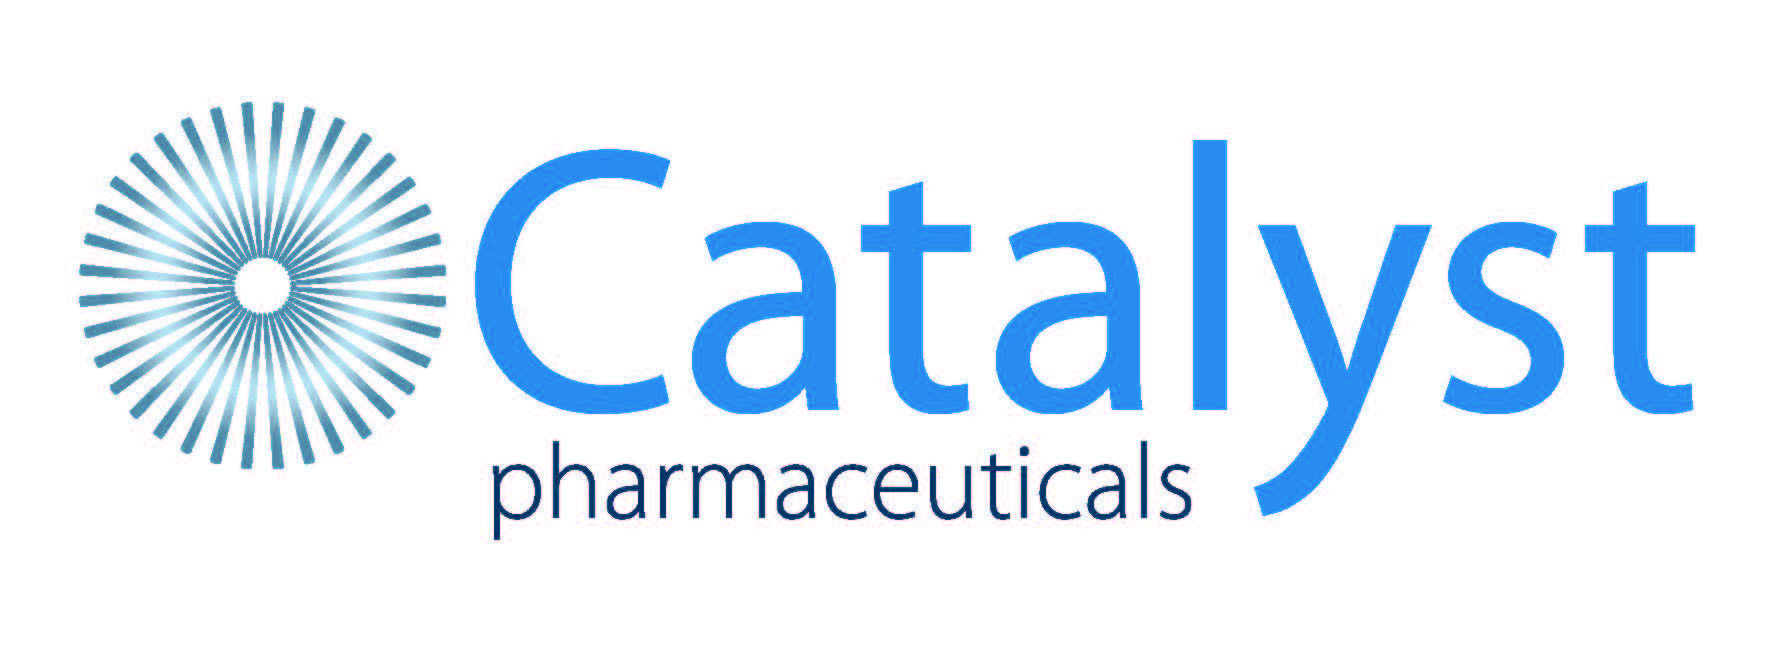 Catalyst Pharma Blog